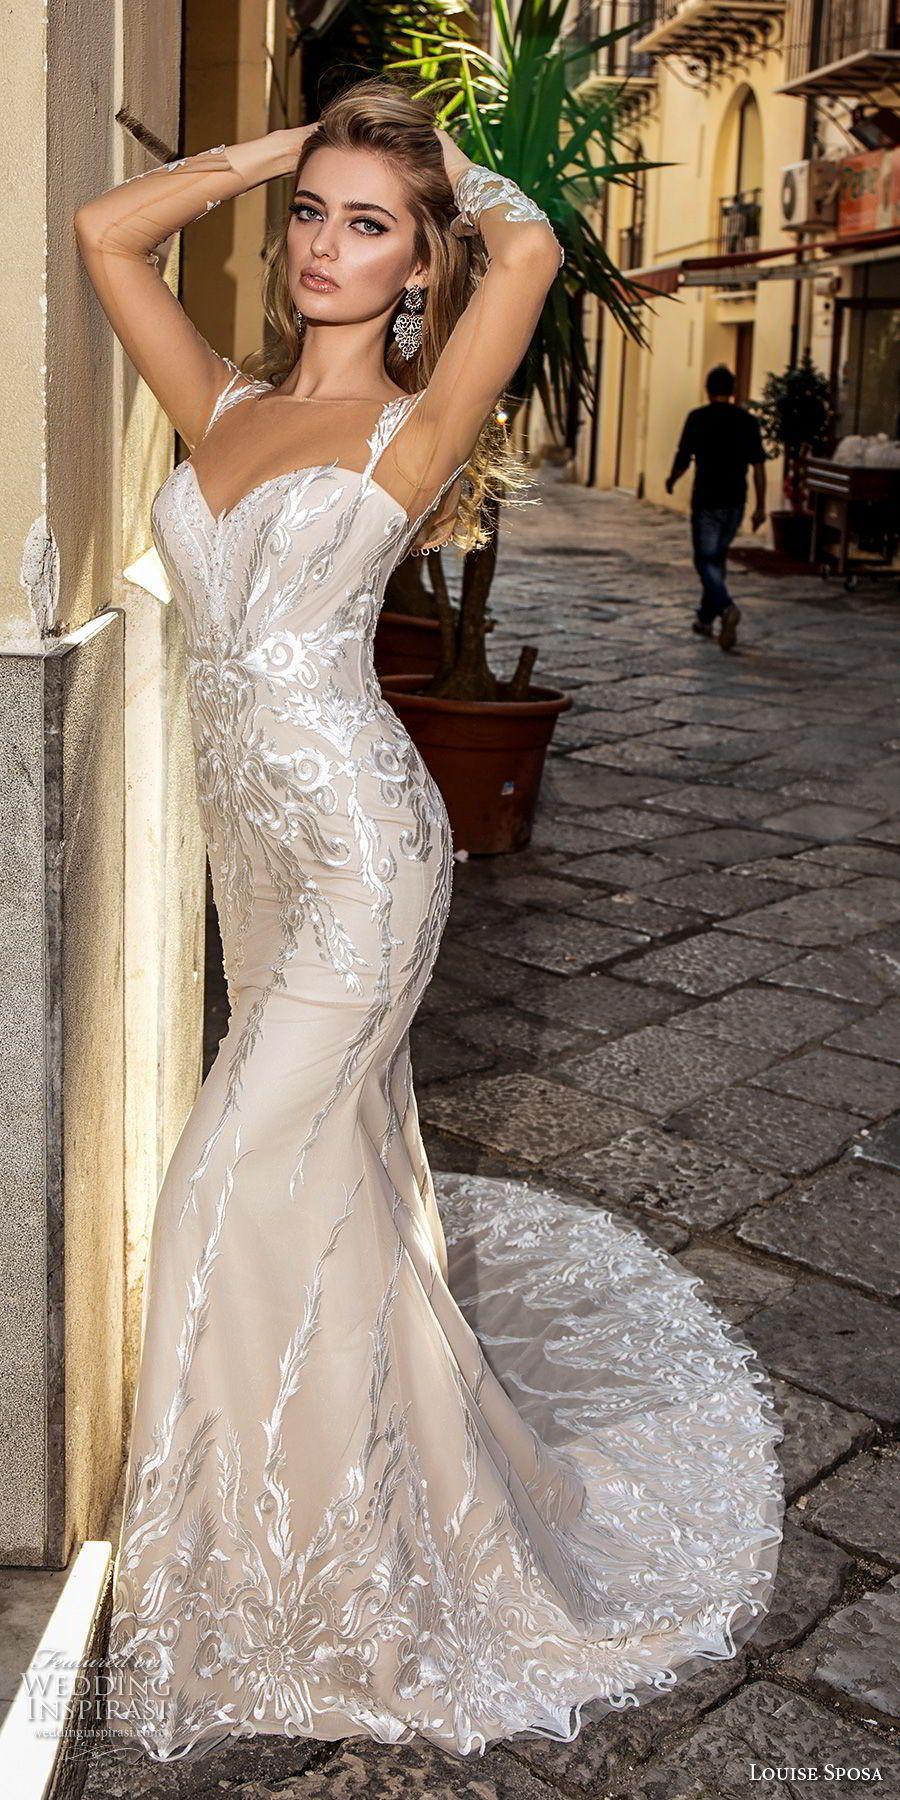 Louise sposa wedding dresses vestidos de novia pinterest